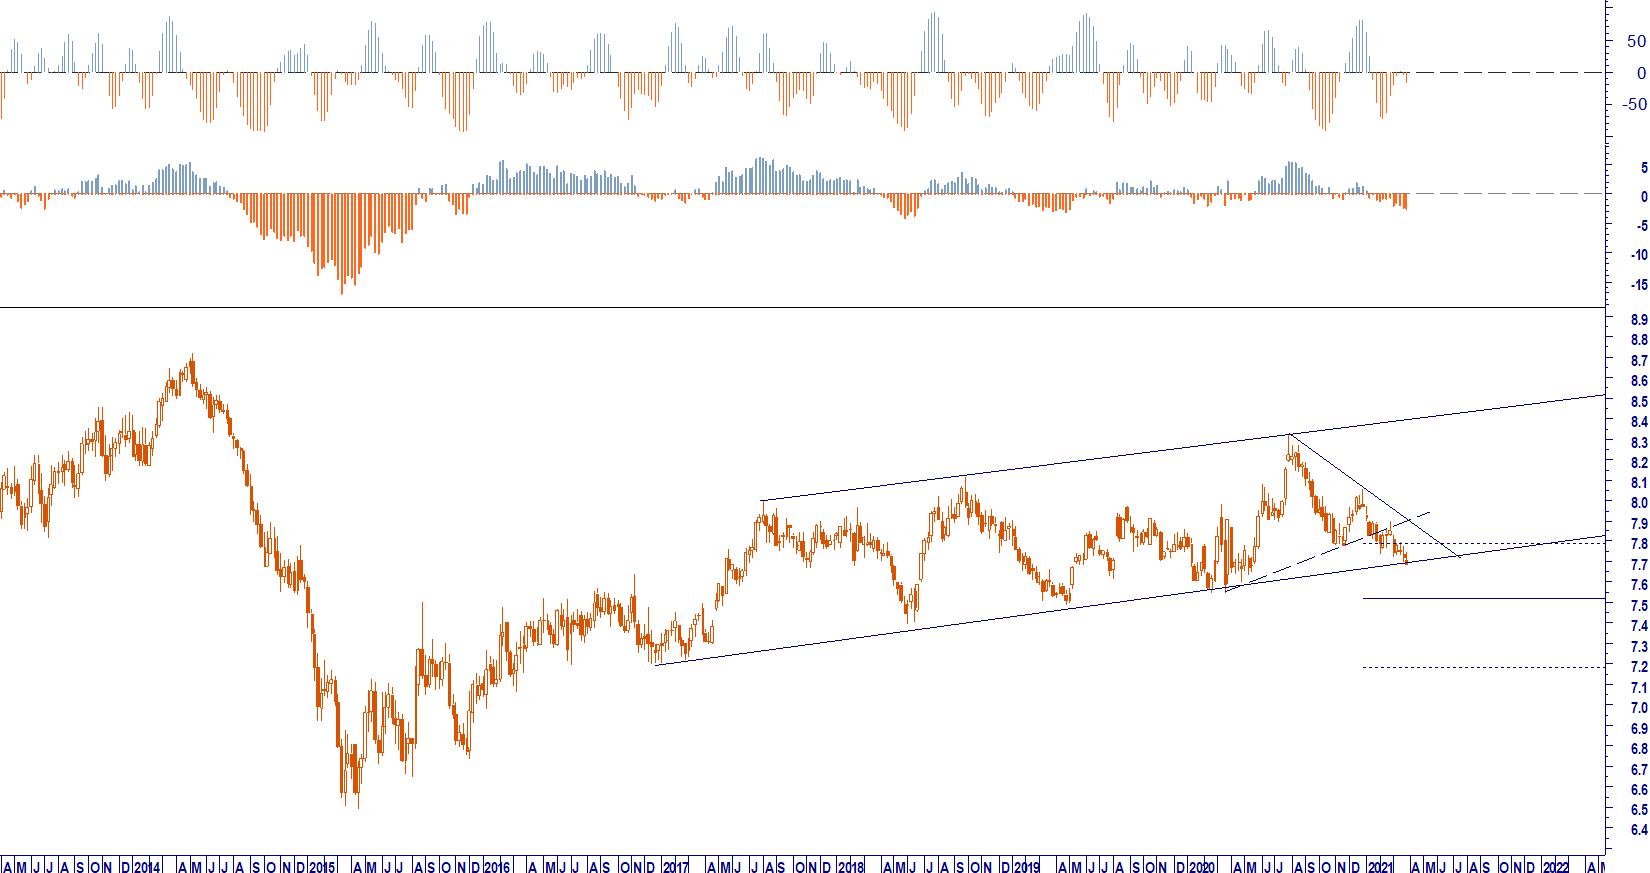 WB ANALYTICS: EUR CNY L_T